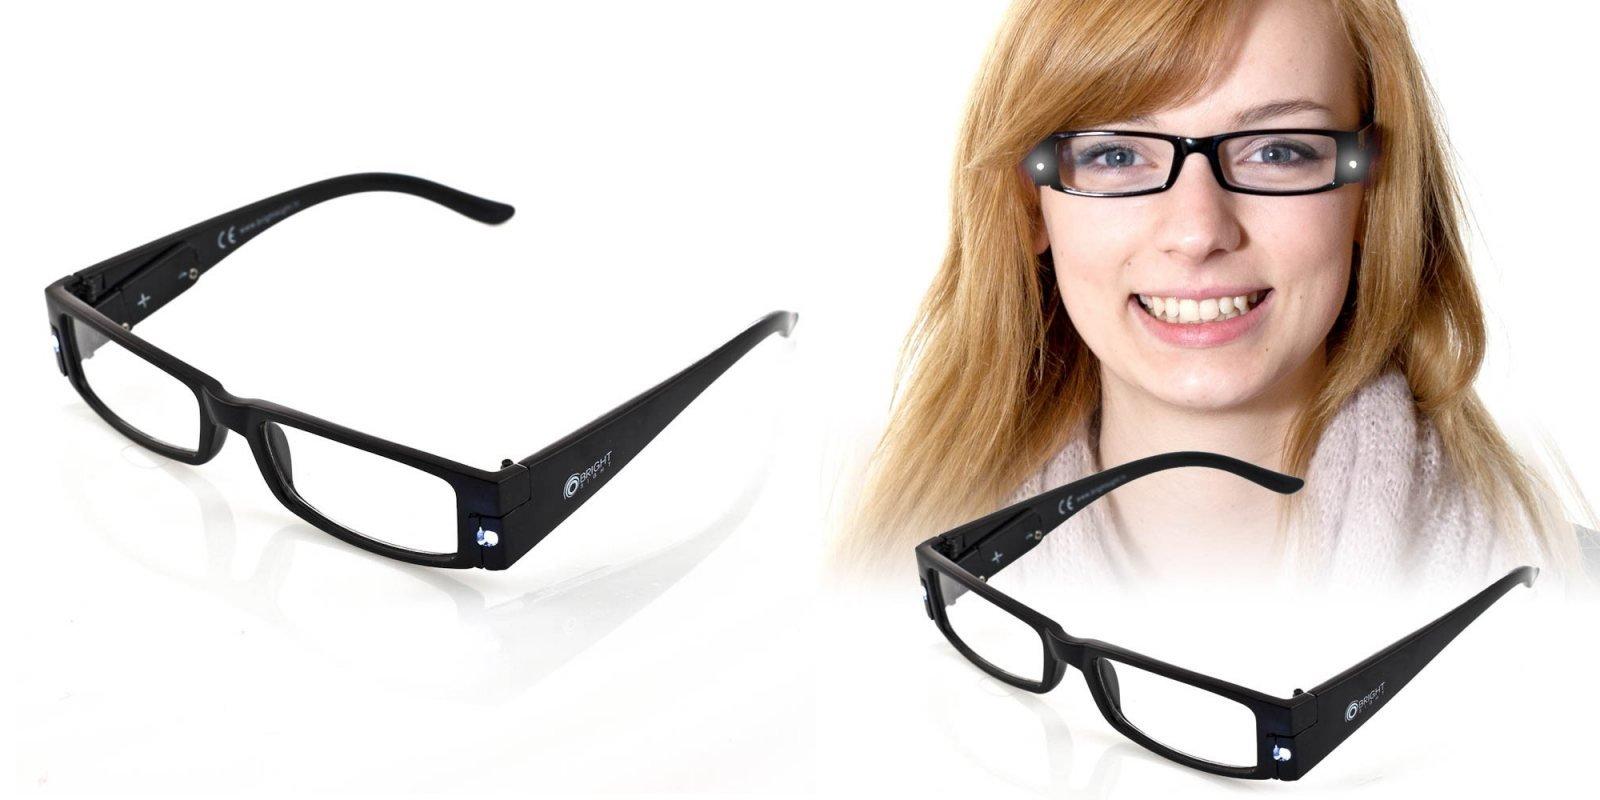 d802649ac2 Gafas de lectura con luz. Ideas para regalar.